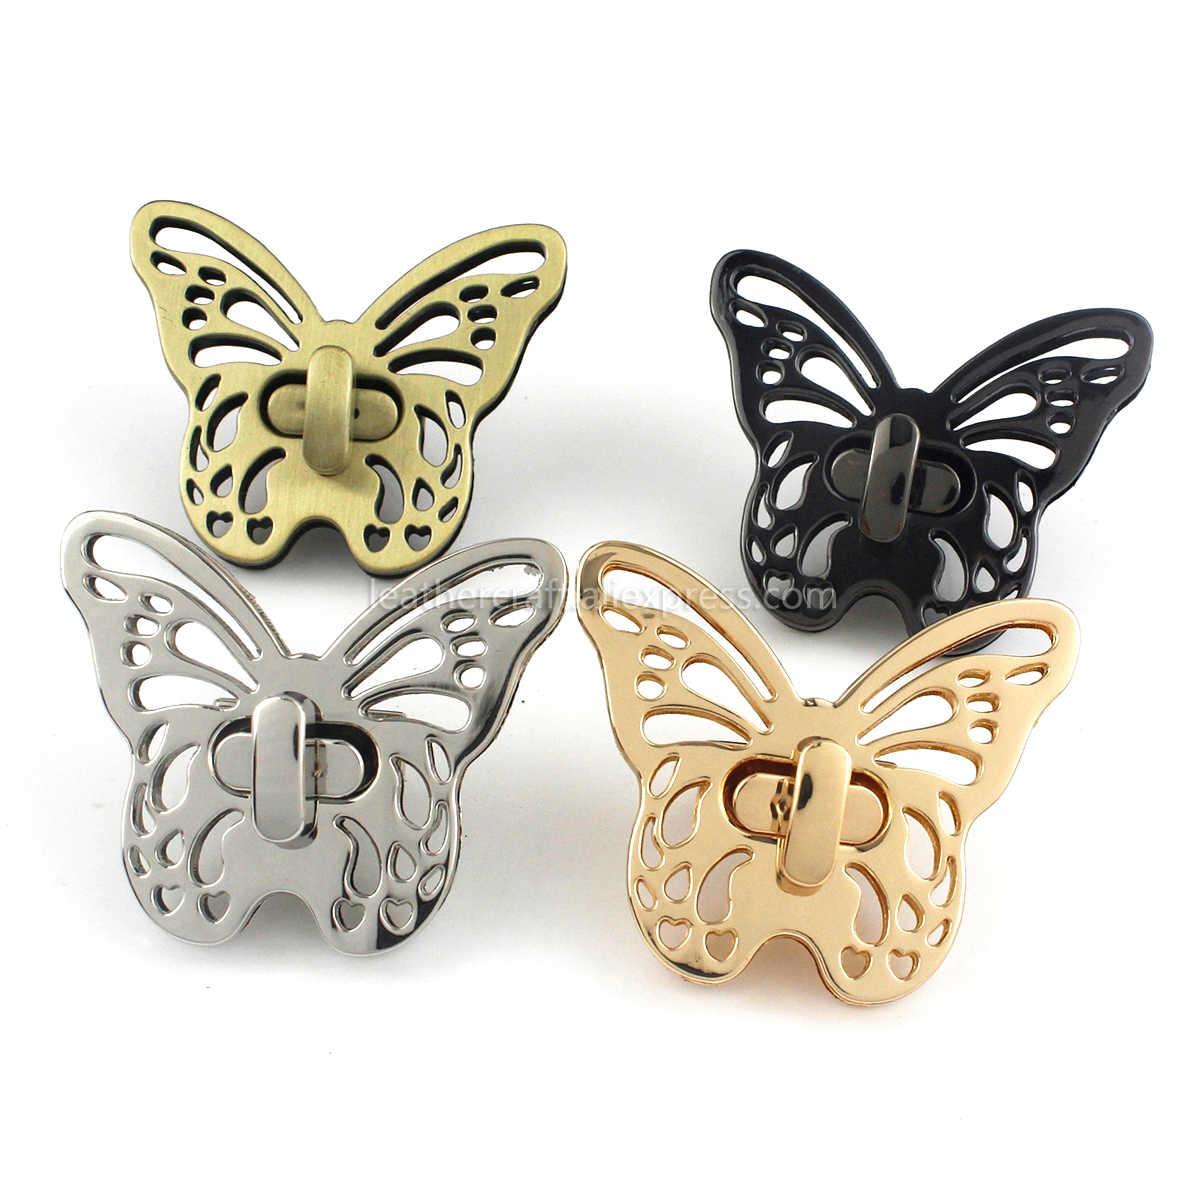 Butterfly Twist Turn Lock Bag Hardware Gold Silver Gunmetal Bronze 220 pcs Handmade Purse Handbag Making Metal 50 35mm 2 1 38 Supplies